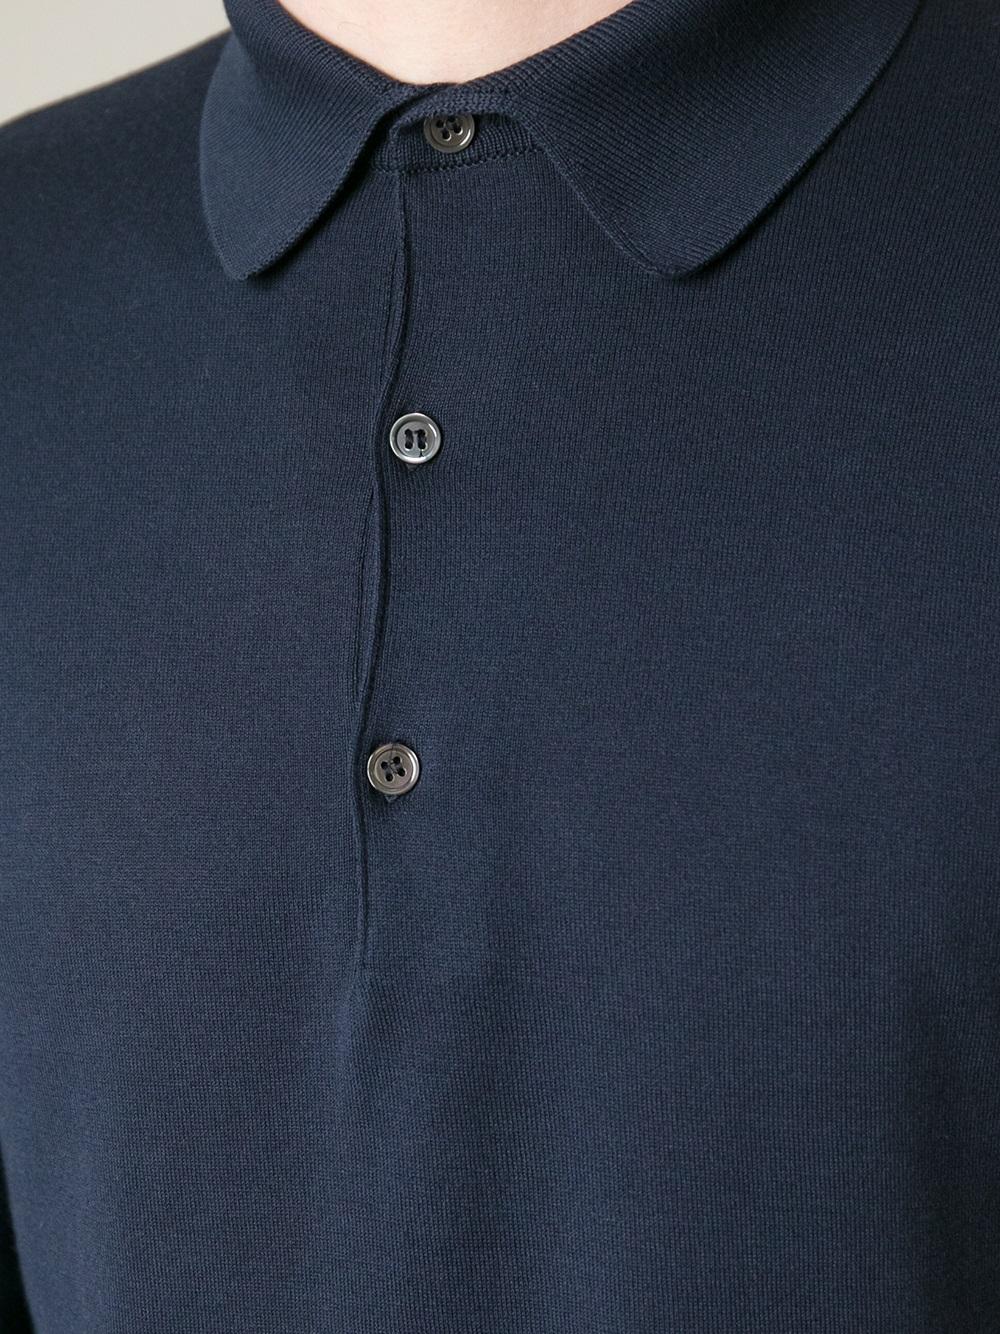 cbd2db04c01d Image 1 of 6. New John Smedley Blue Exeter Polo Shirt ...